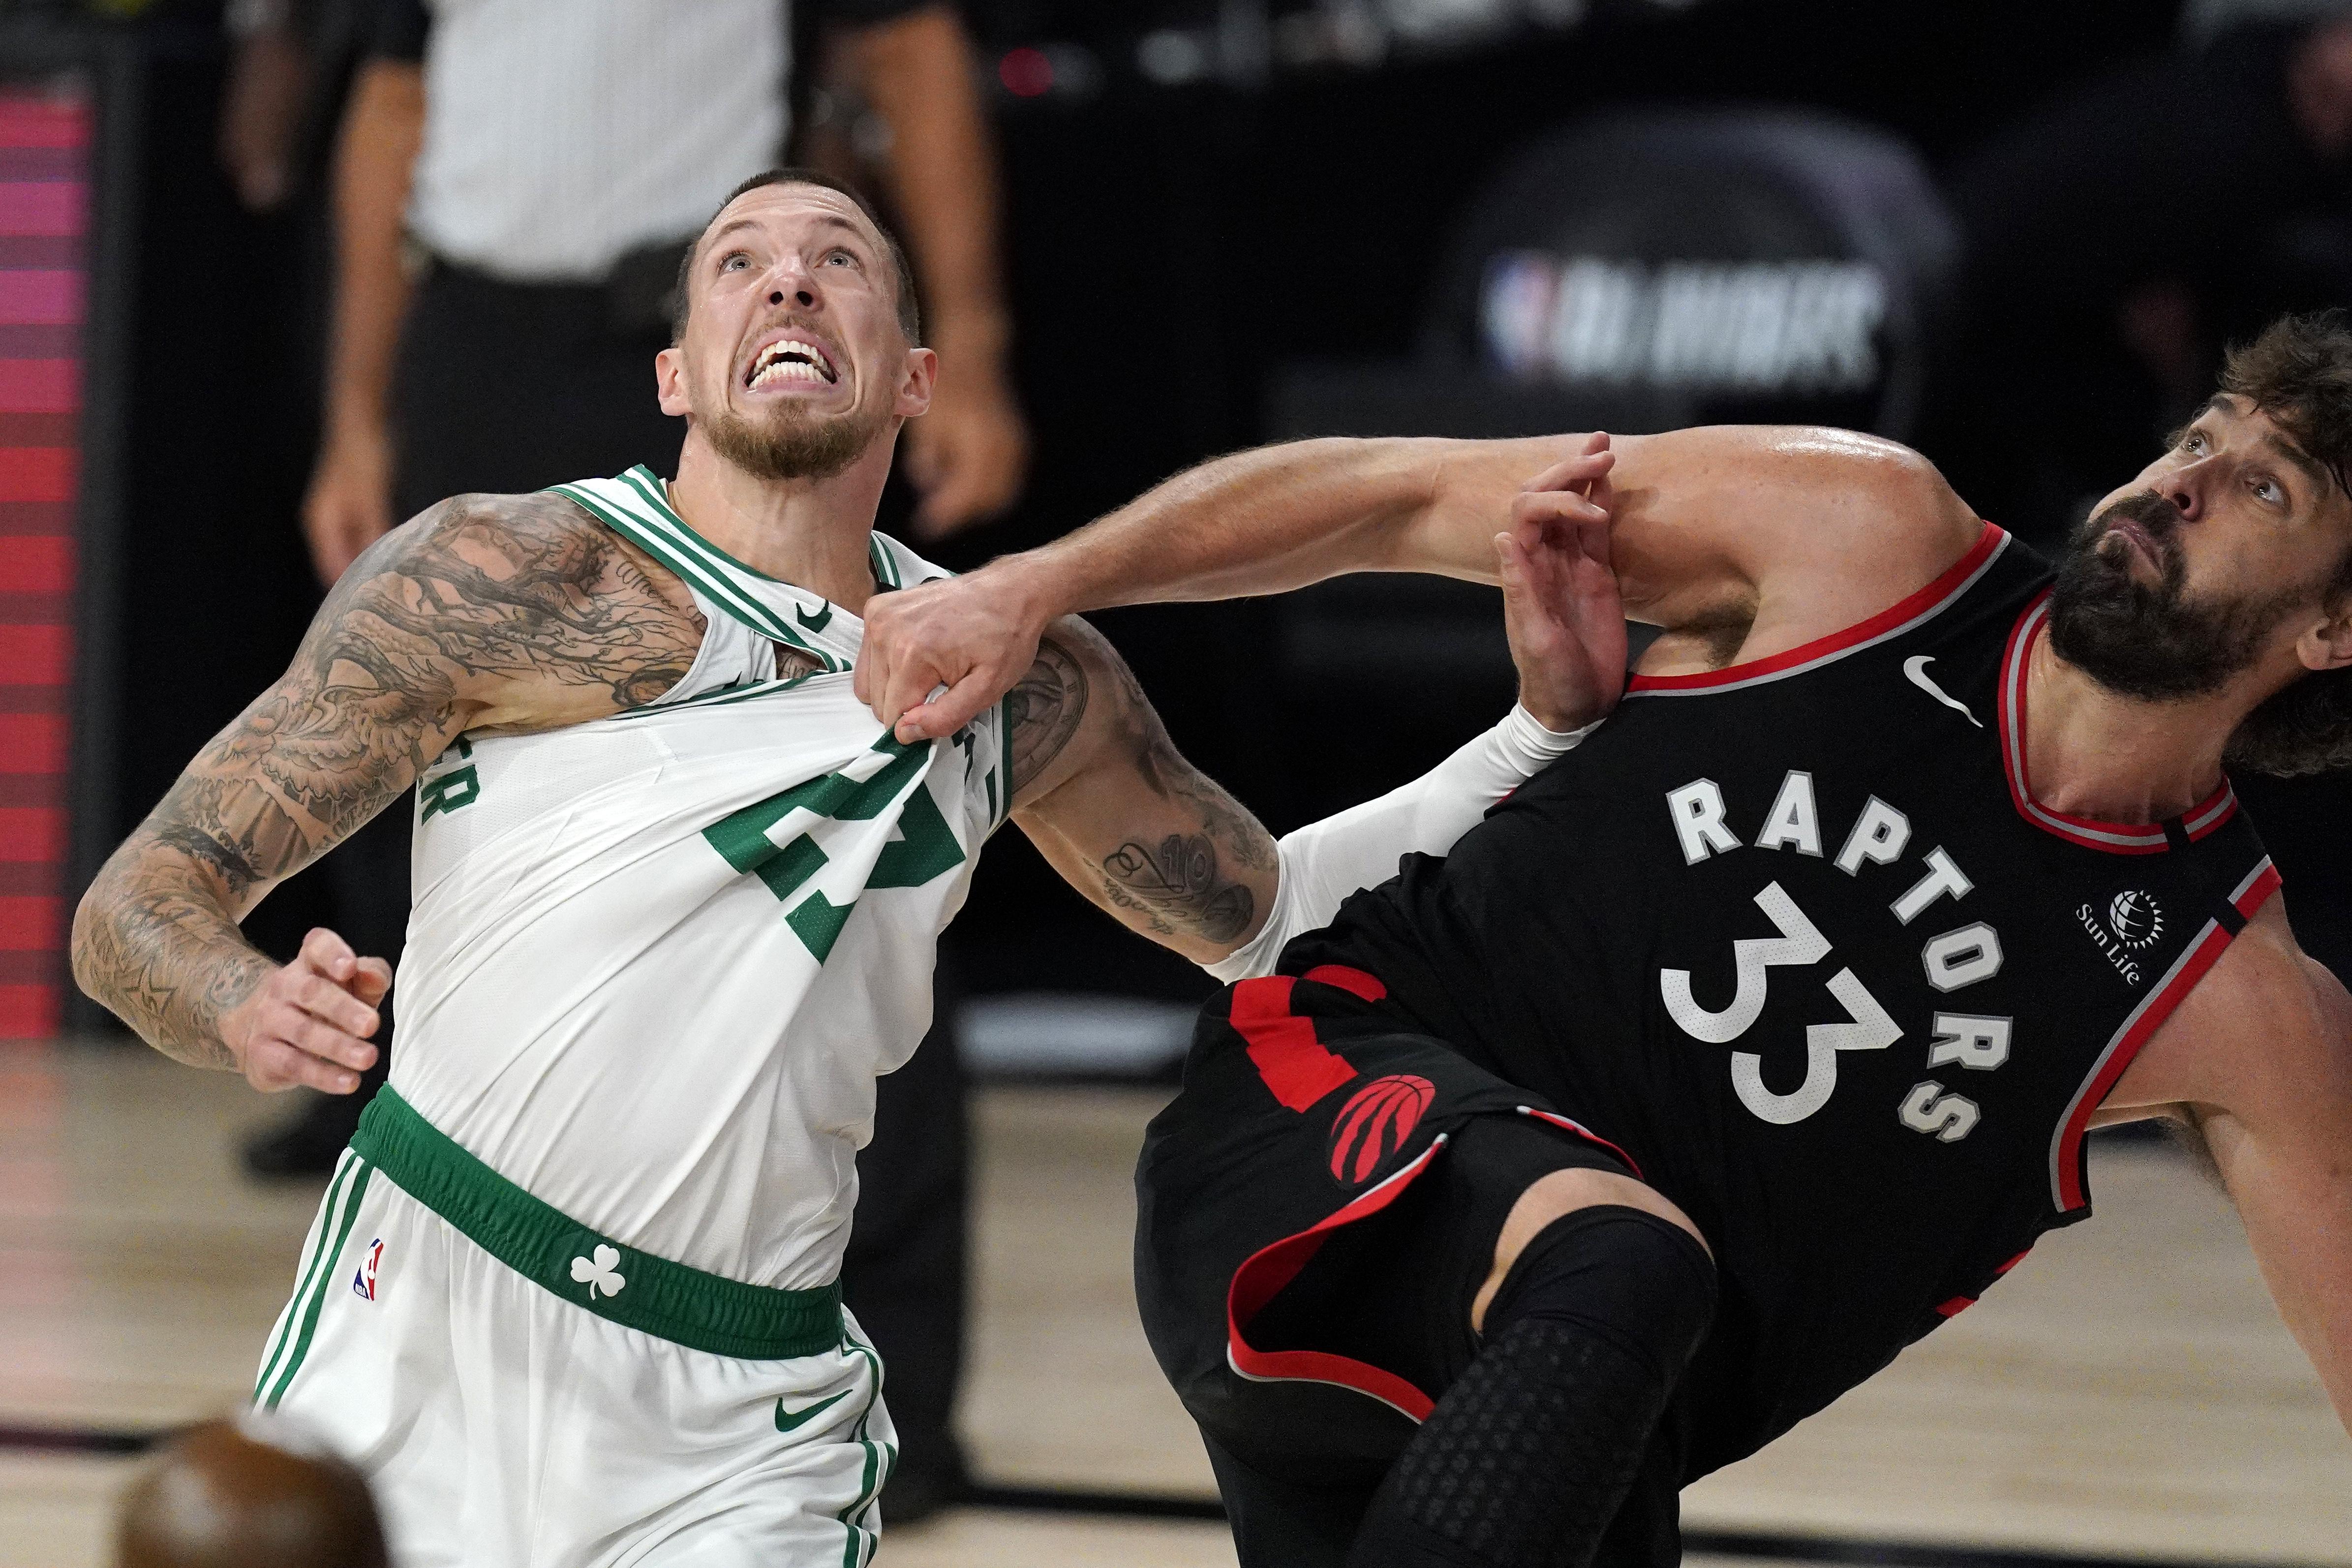 Toronto Raptors Vs Boston Celtics Game 5 Free Live Stream 9 7 20 Watch Nba Playoffs Online Time Tv Channel Nj Com